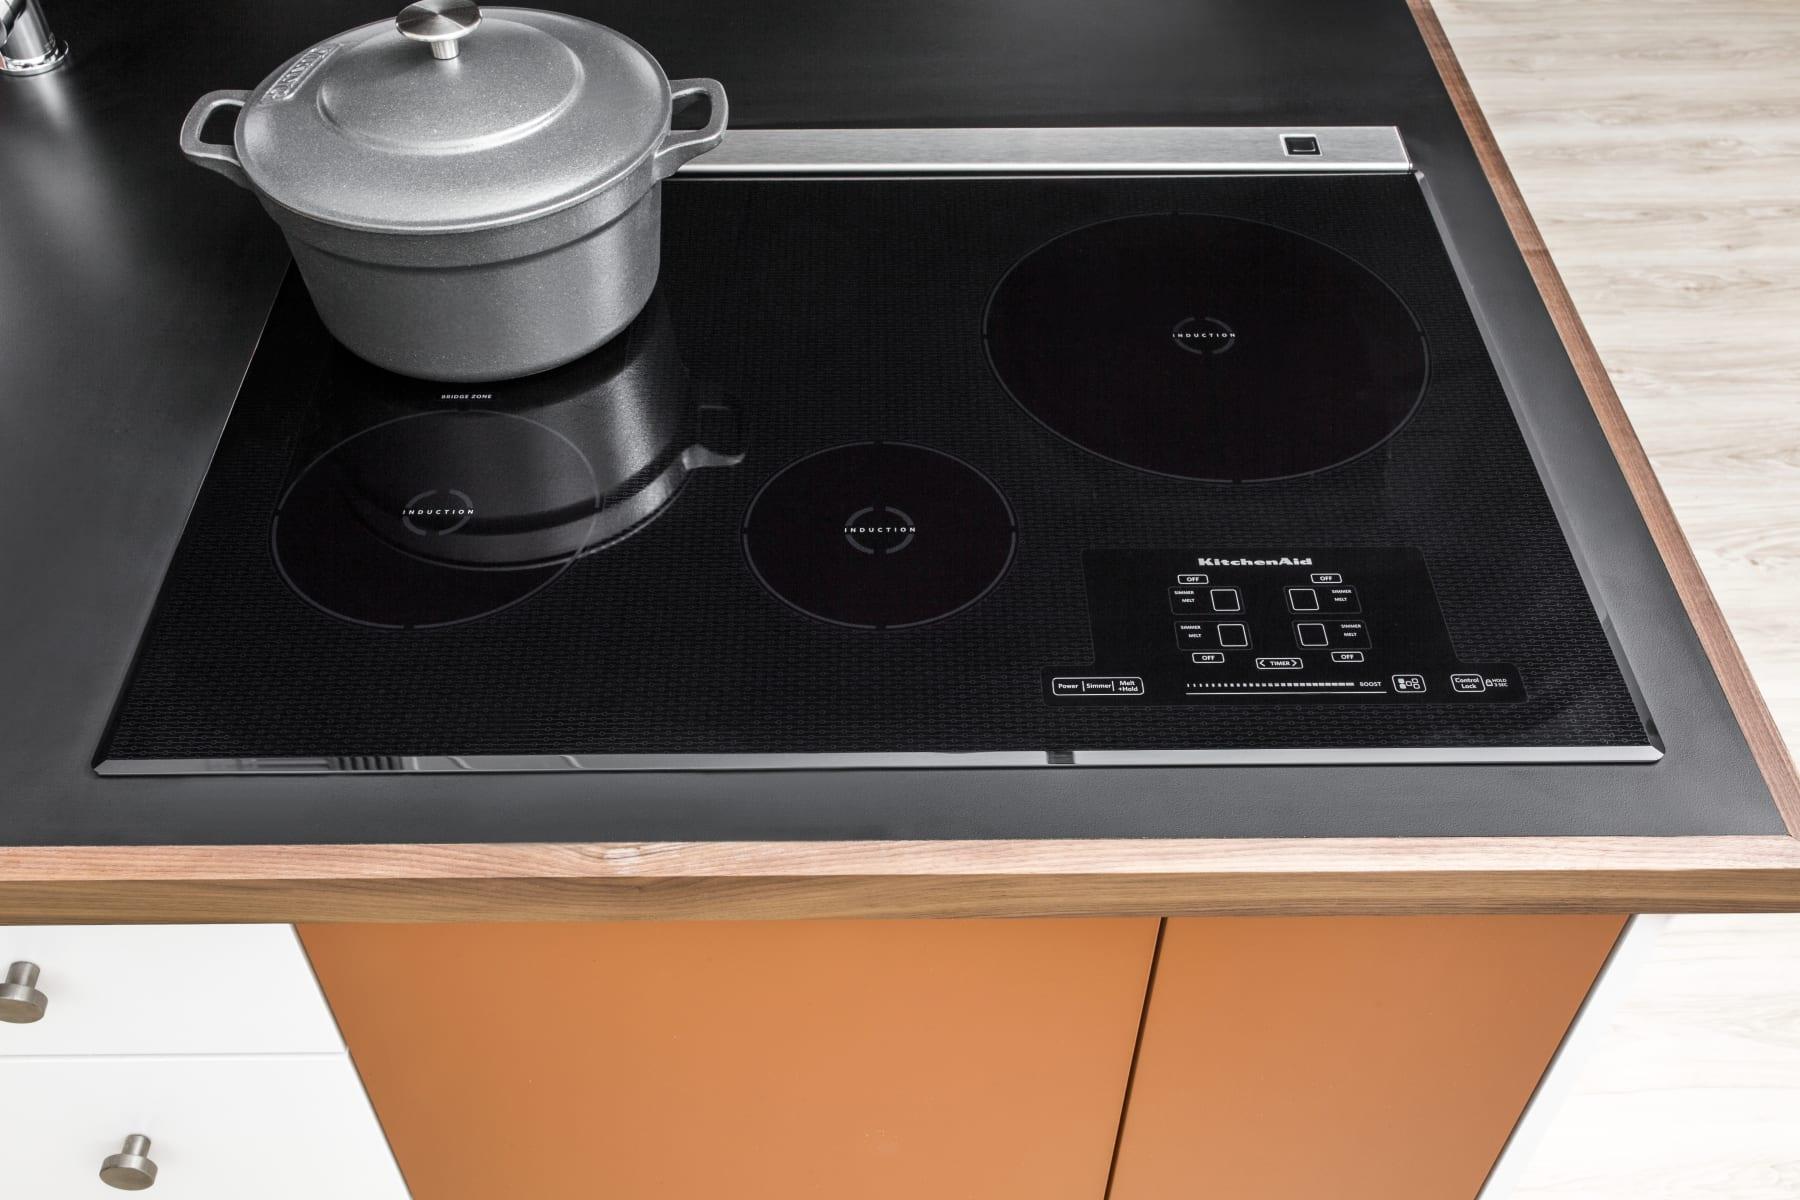 Kitchenaid Cooktop Cooktops Kicu509x